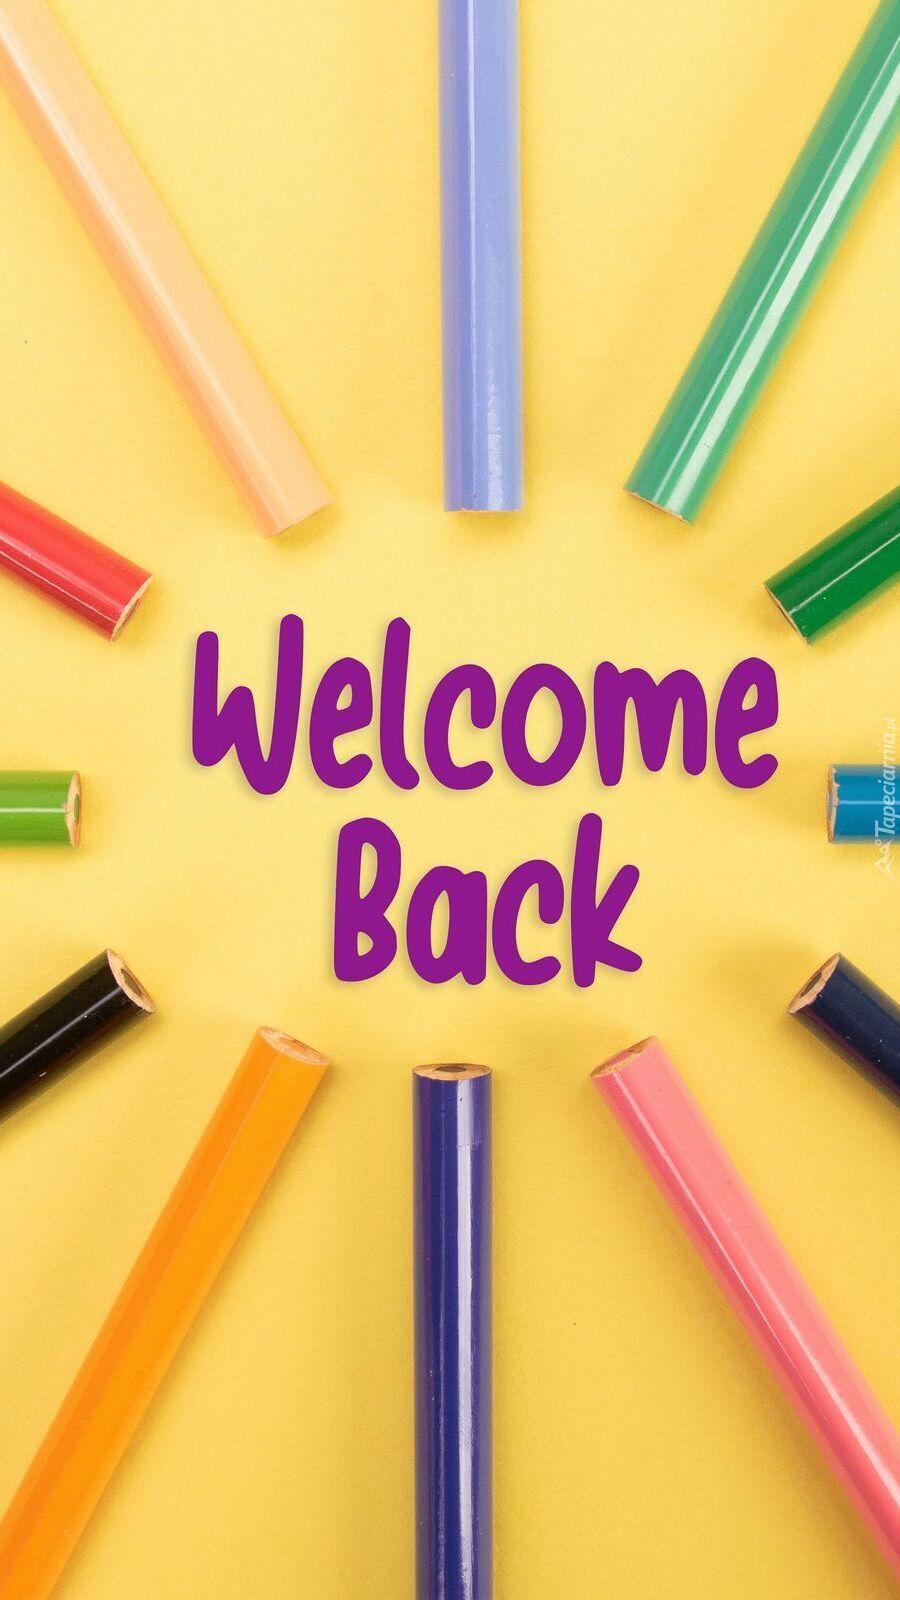 Kredki wokół napisu Welcome Back